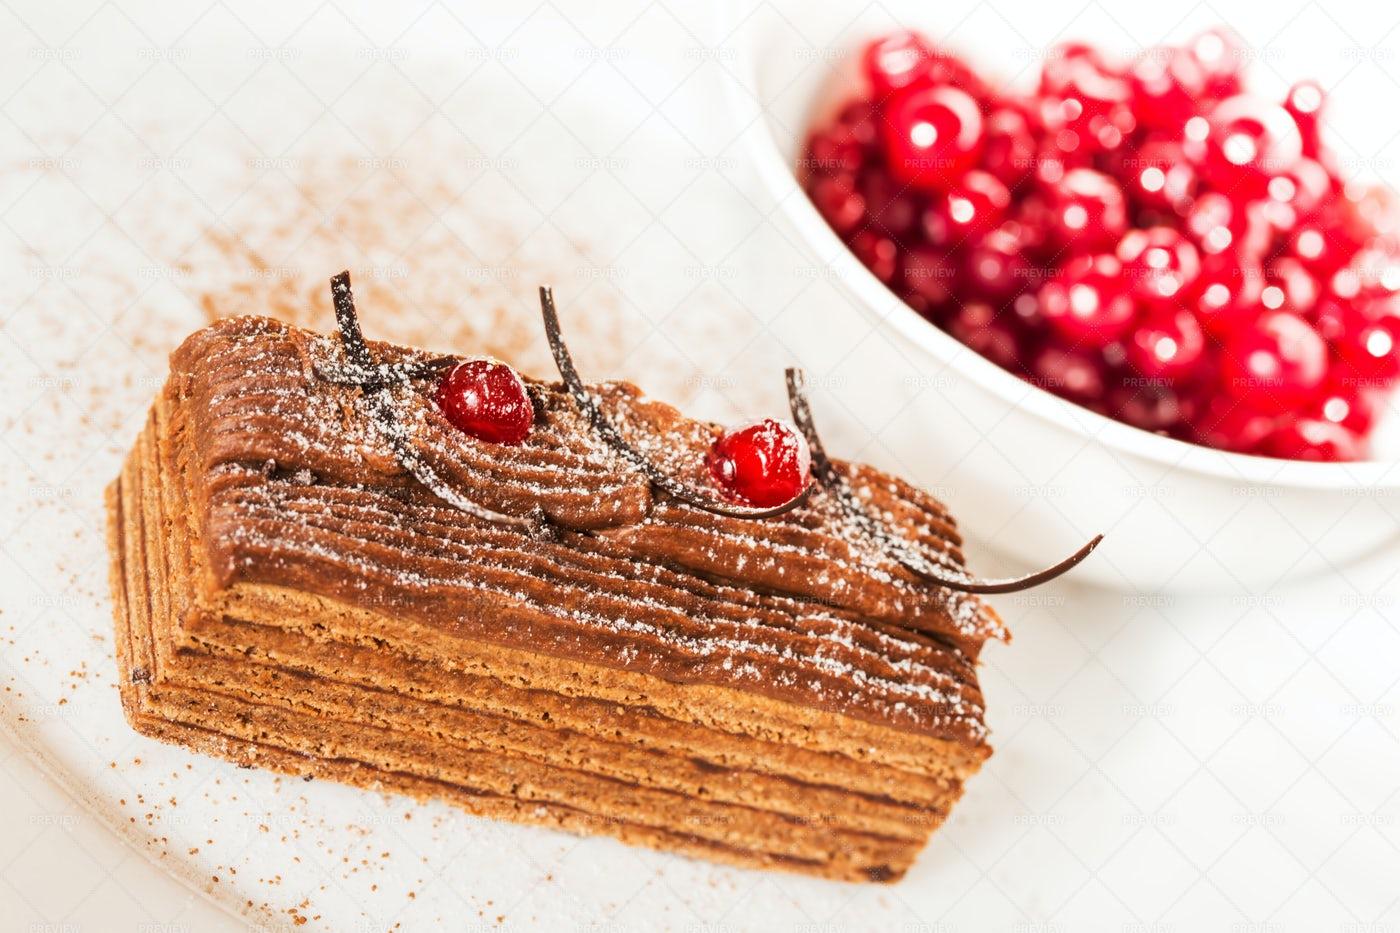 Piece Of Honey Cake: Stock Photos